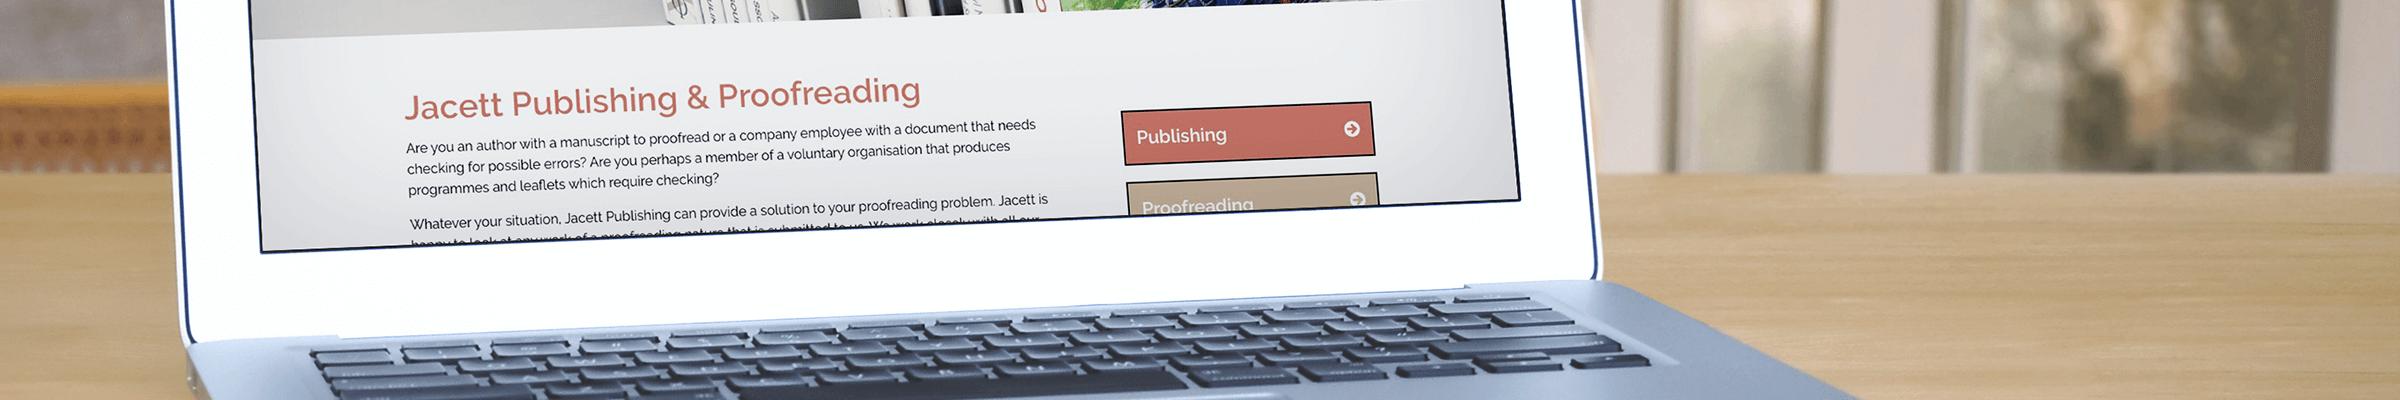 Jacett Publishing goes live